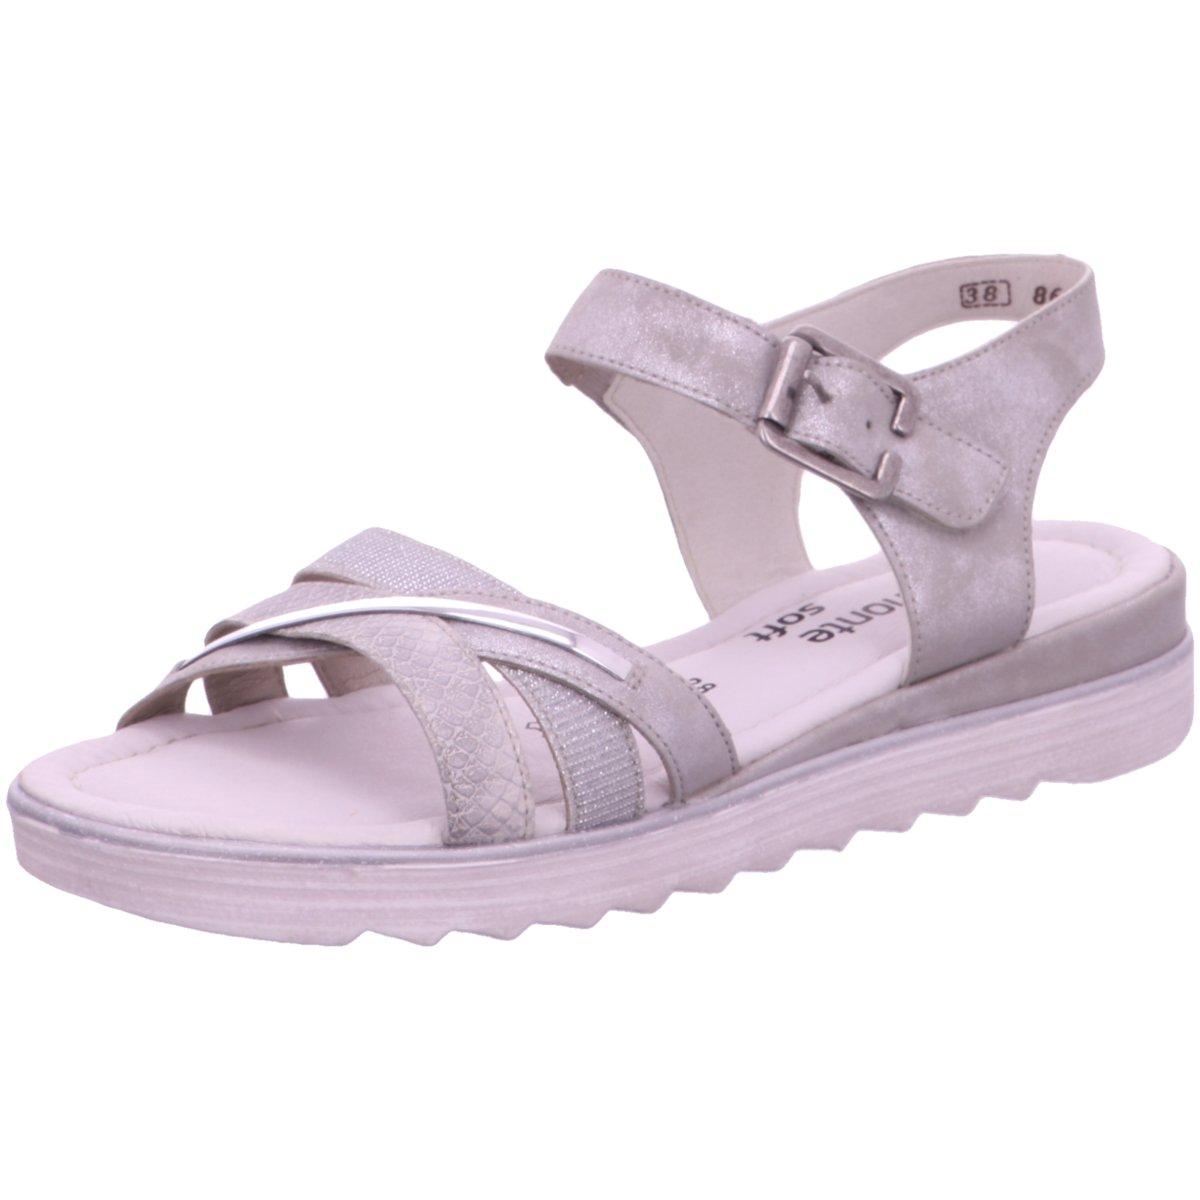 Remonte Damen Sandaletten D1151-90 grau 324305